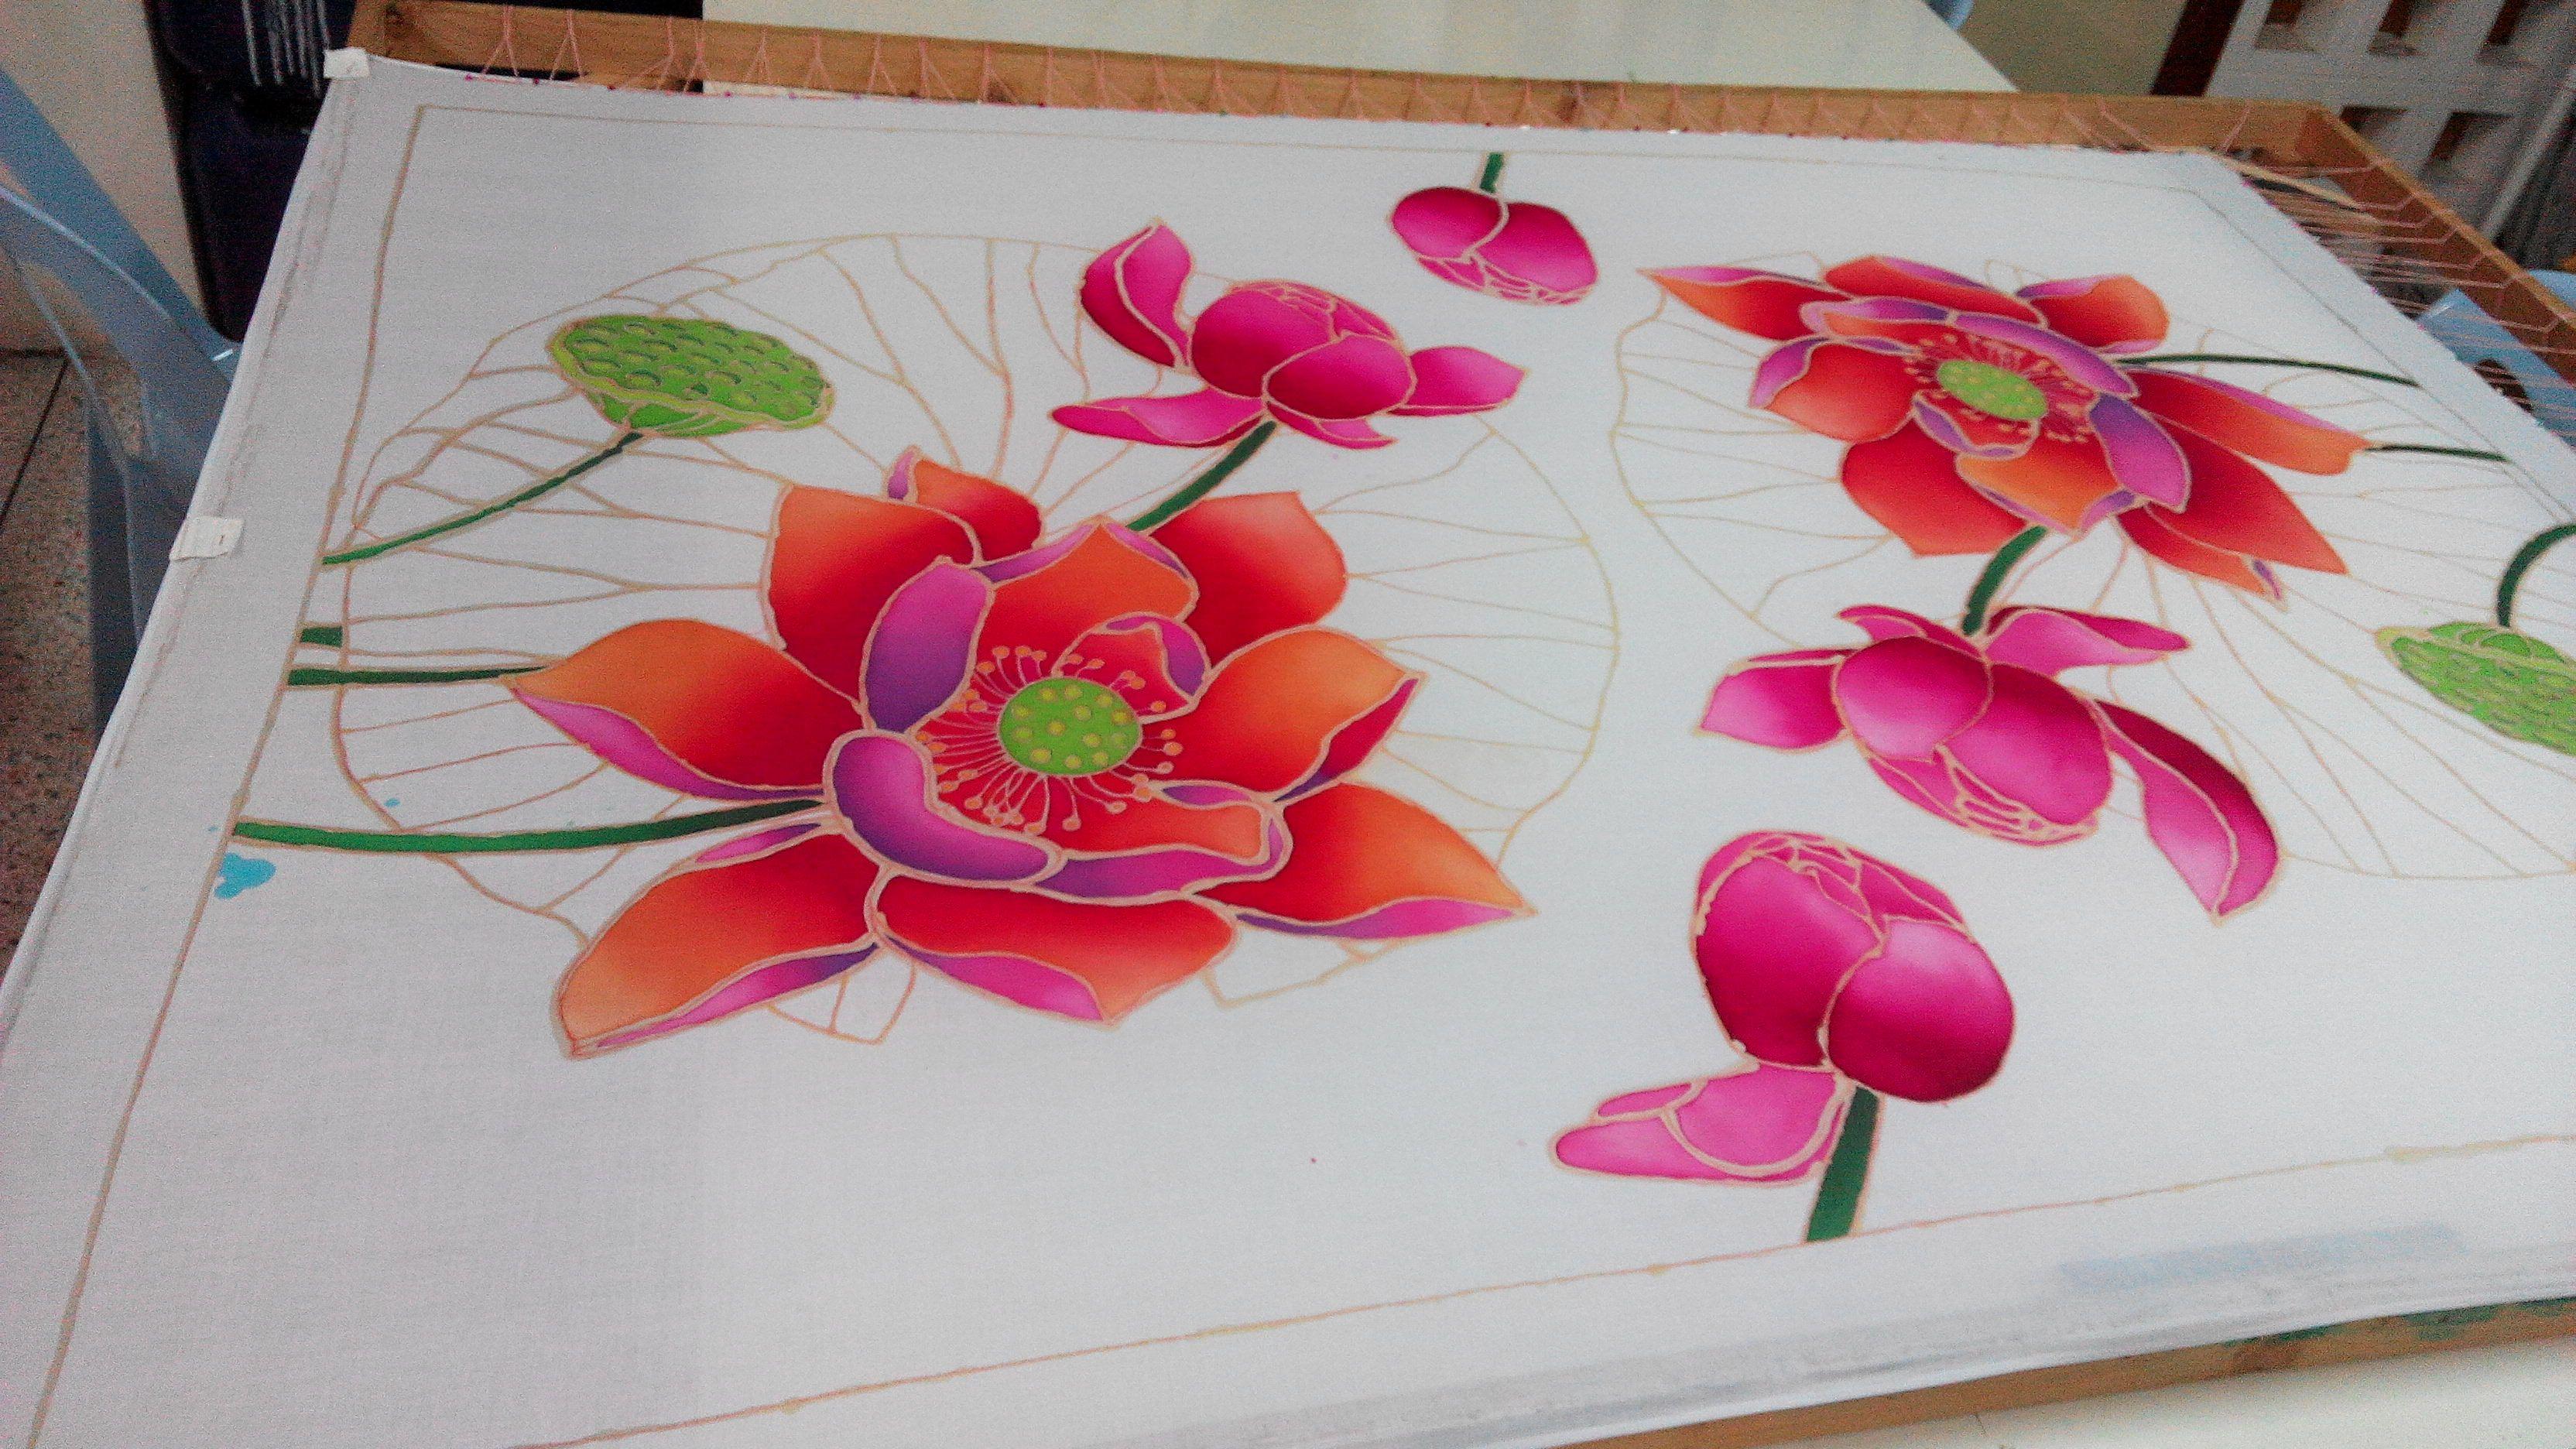 Red lotus piano cover batik cotton handmade batik art on cotton red lotus piano cover batik cotton handmade izmirmasajfo